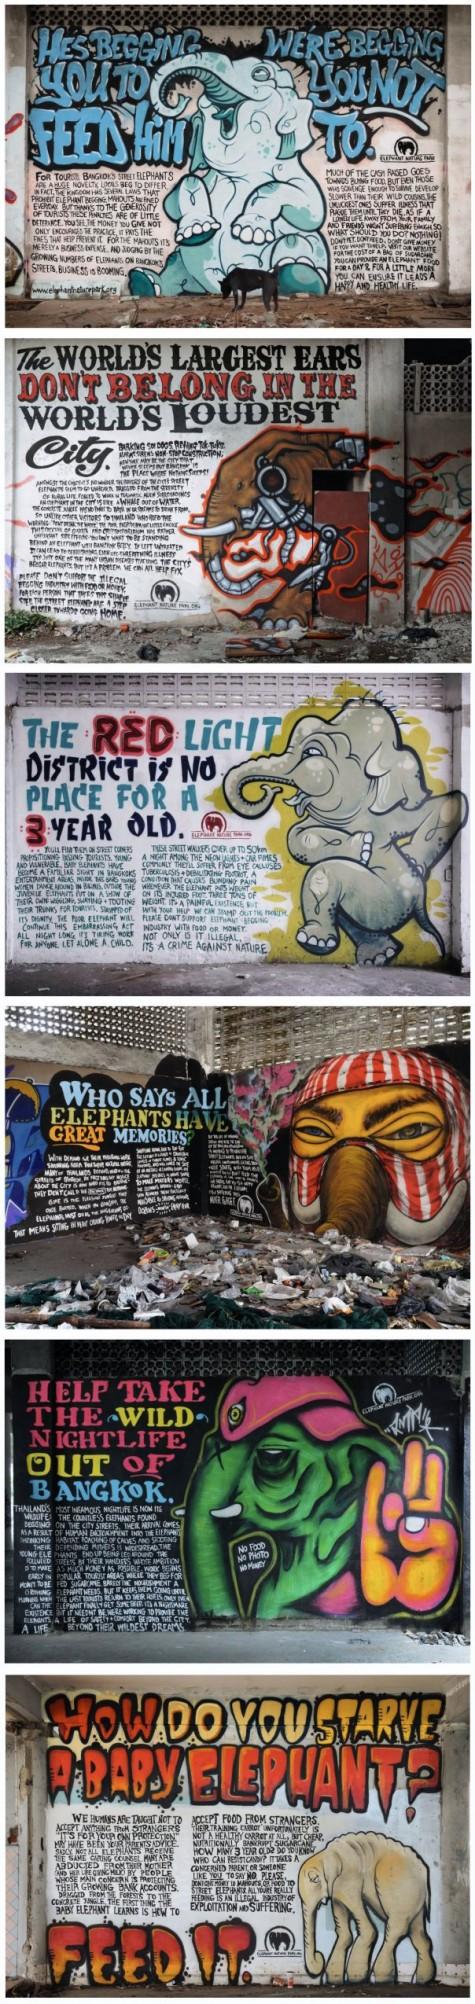 Elephant Campaign